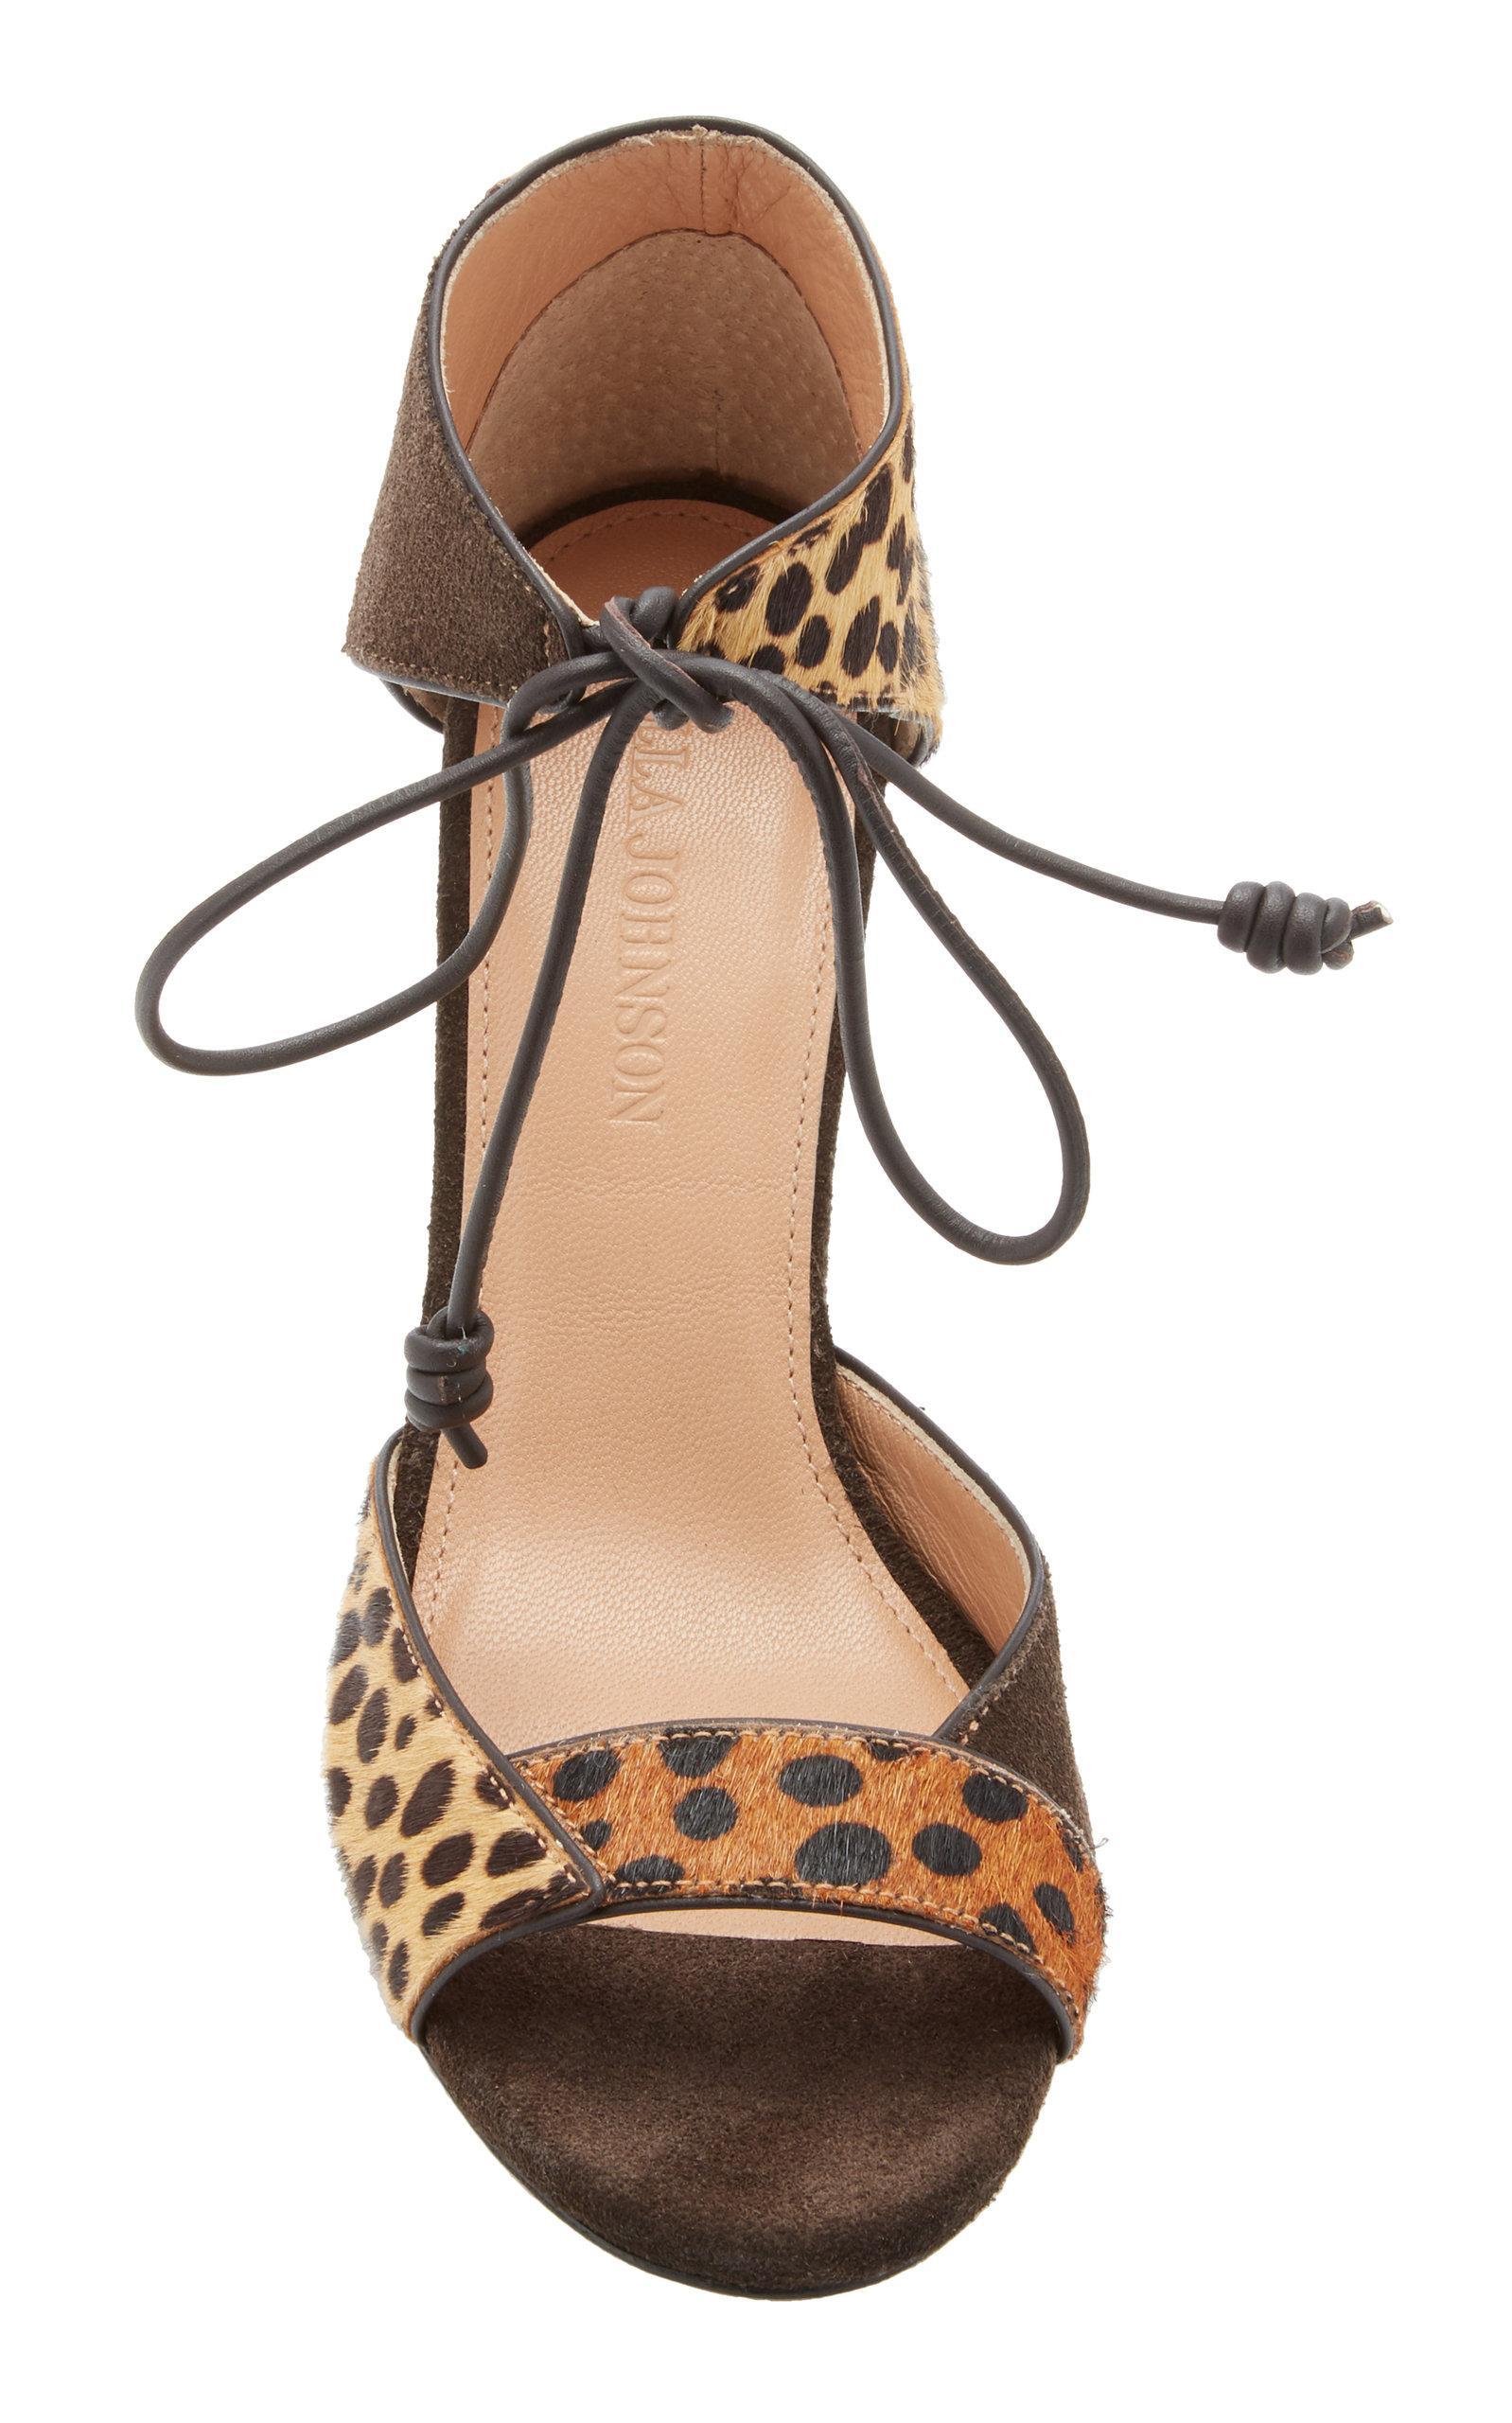 adc31528afca Ulla Johnson - Multicolor Mischa Leopard Sandals - Lyst. View fullscreen